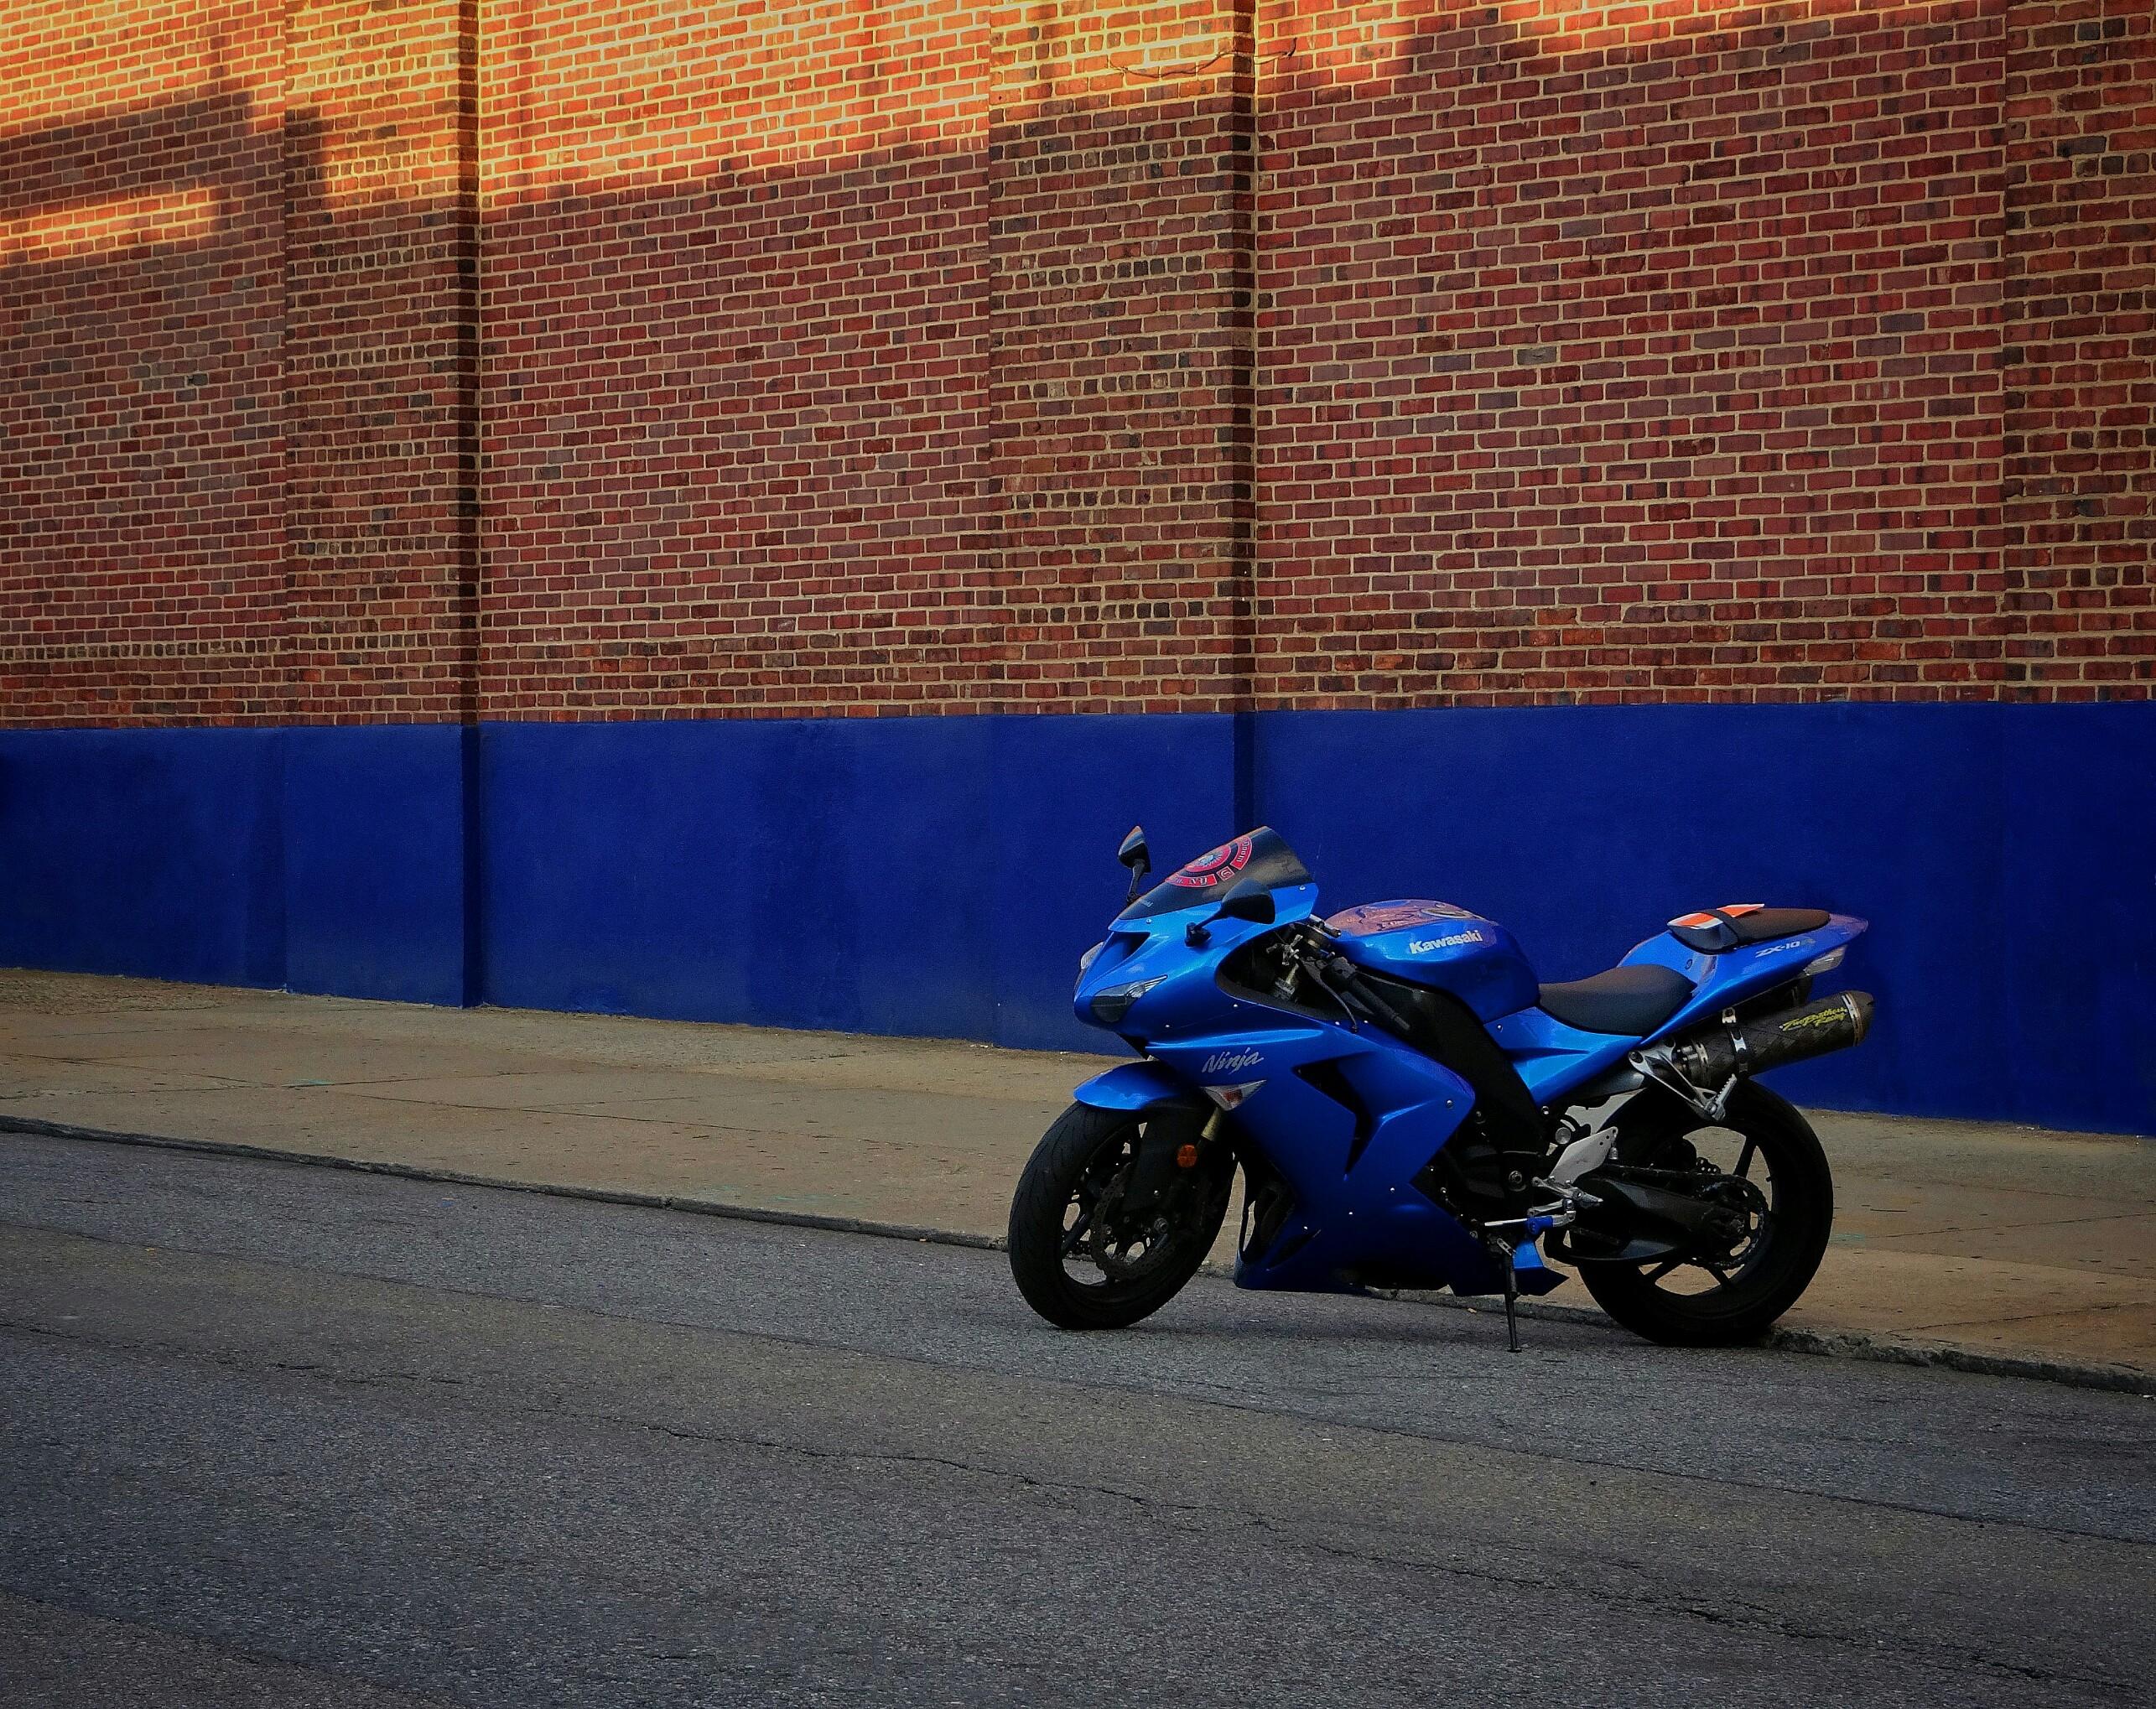 Motorbike Wall Stickers Ninja Kawasaki Blue Motocycle Motorbike Royalblue Wall